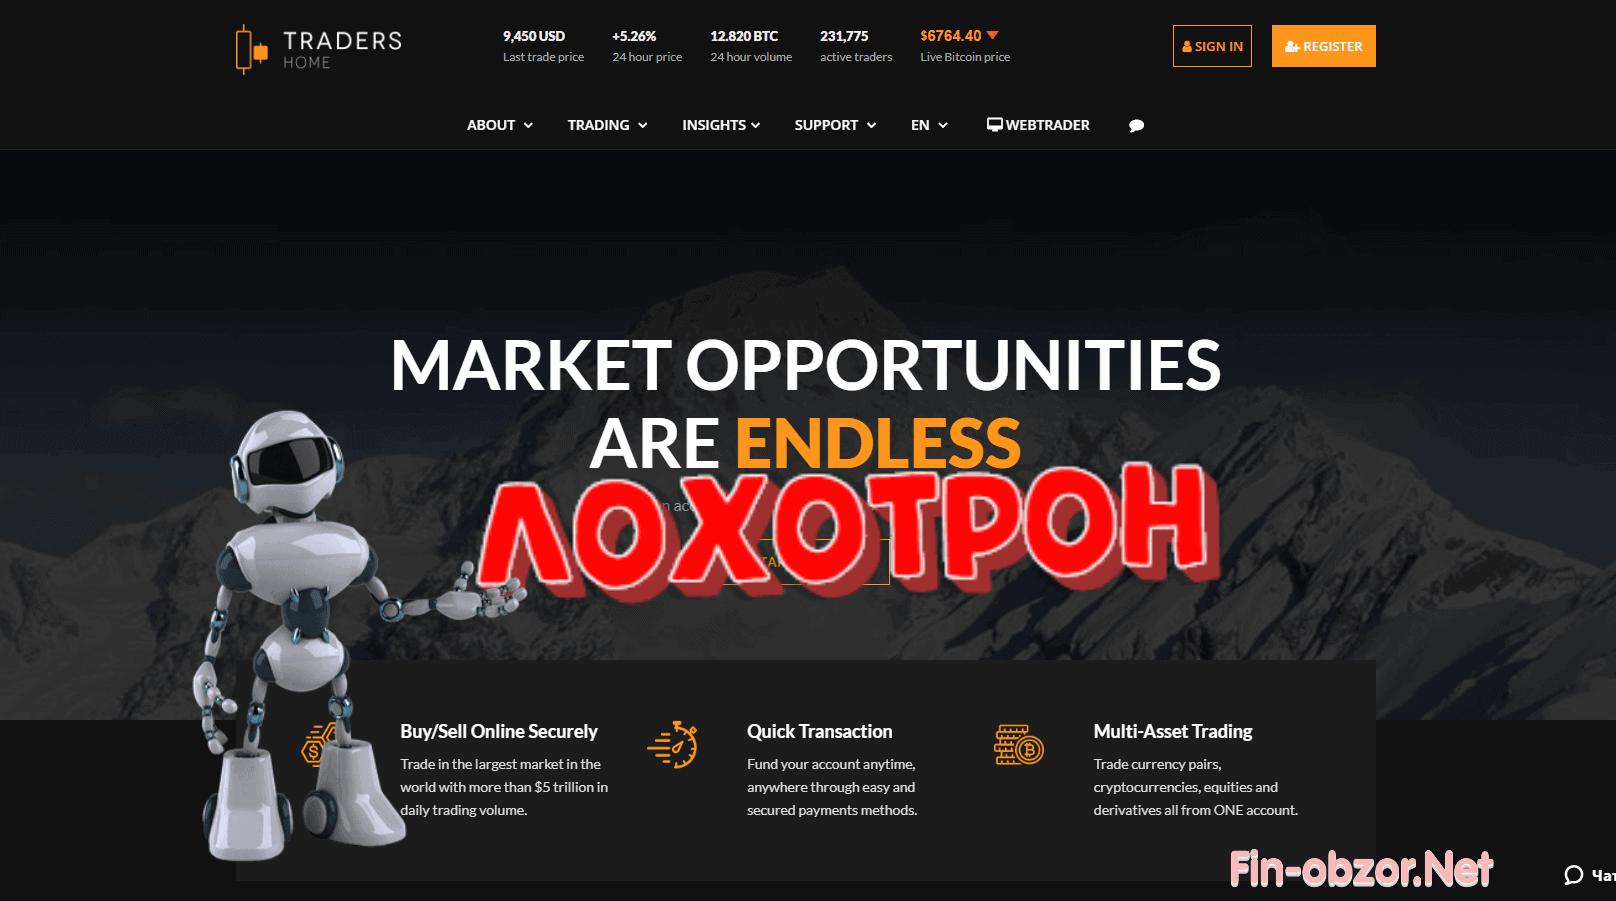 TradersHome (tradershome.com) отзывы. Развод лохотрон мошенники